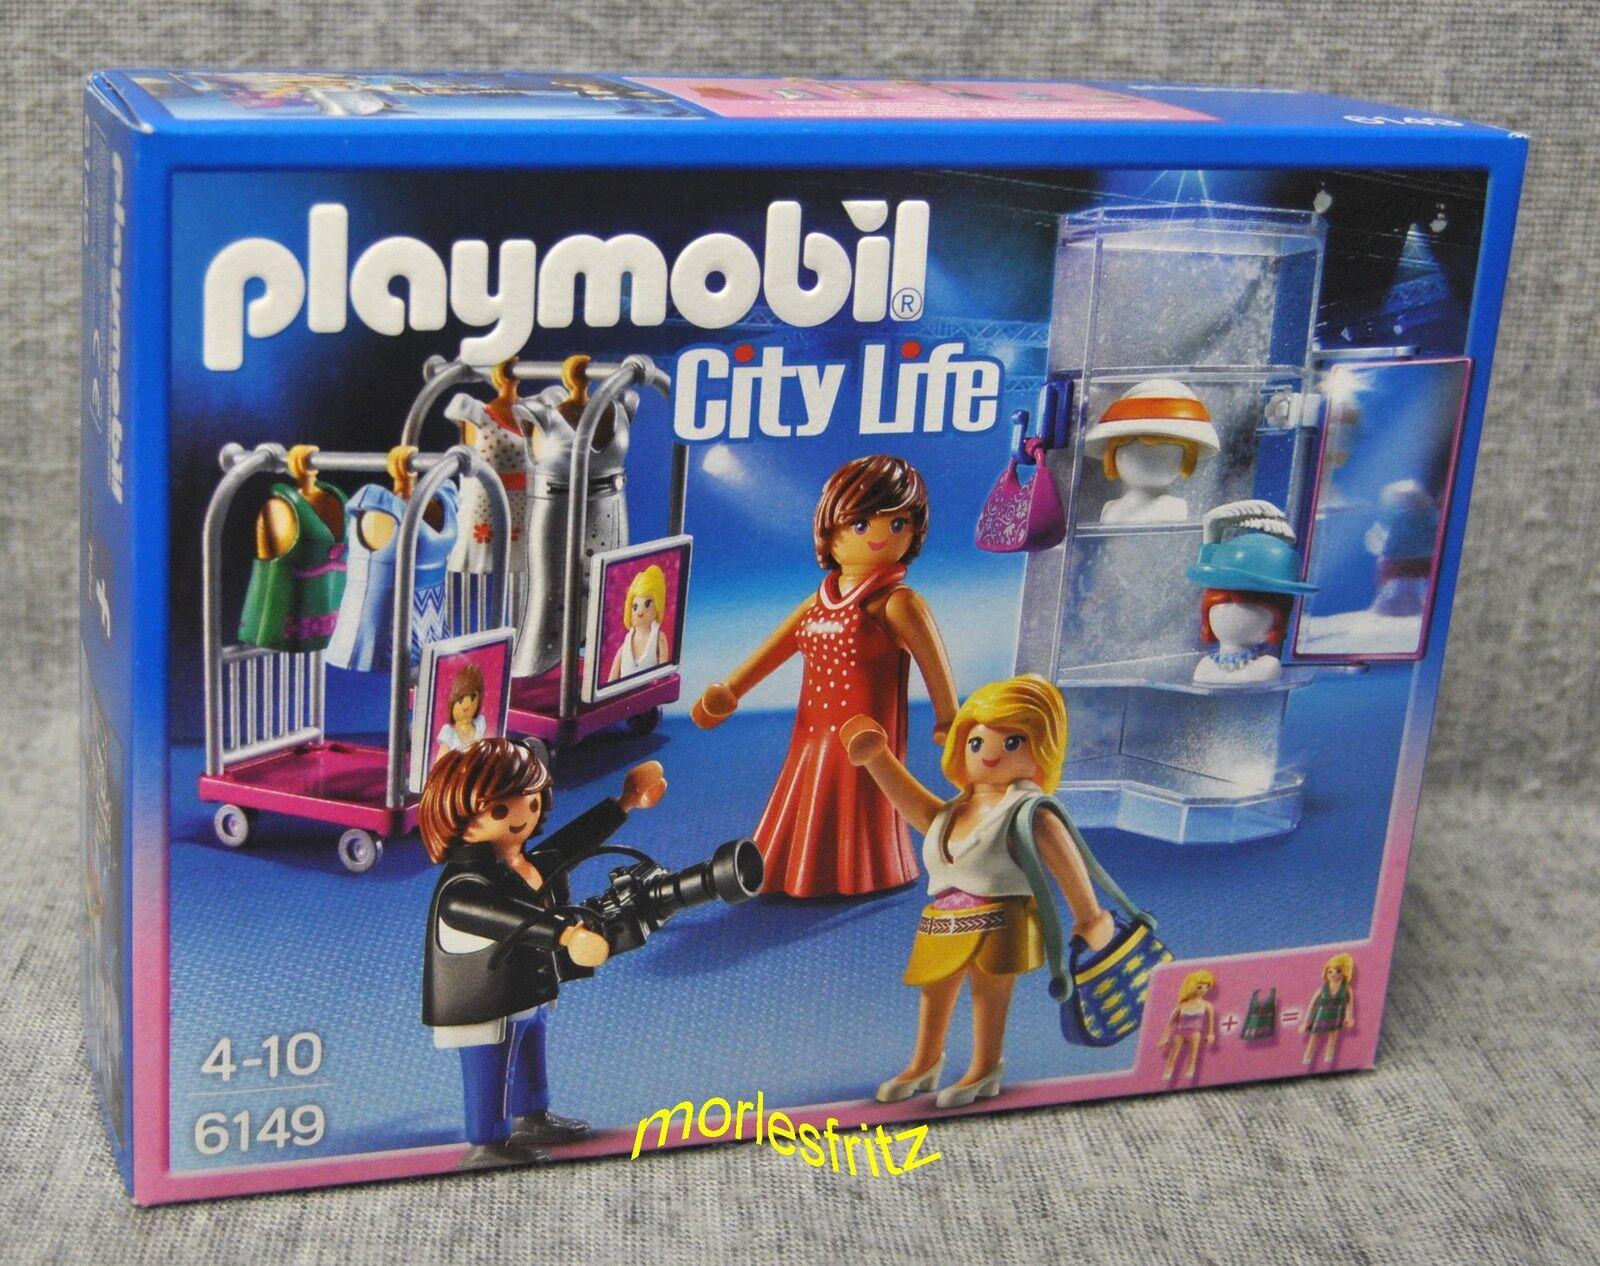 Playmobil 6149 MODENSCHAU mit Fotoshooting - Castingshow - City Life - Neu